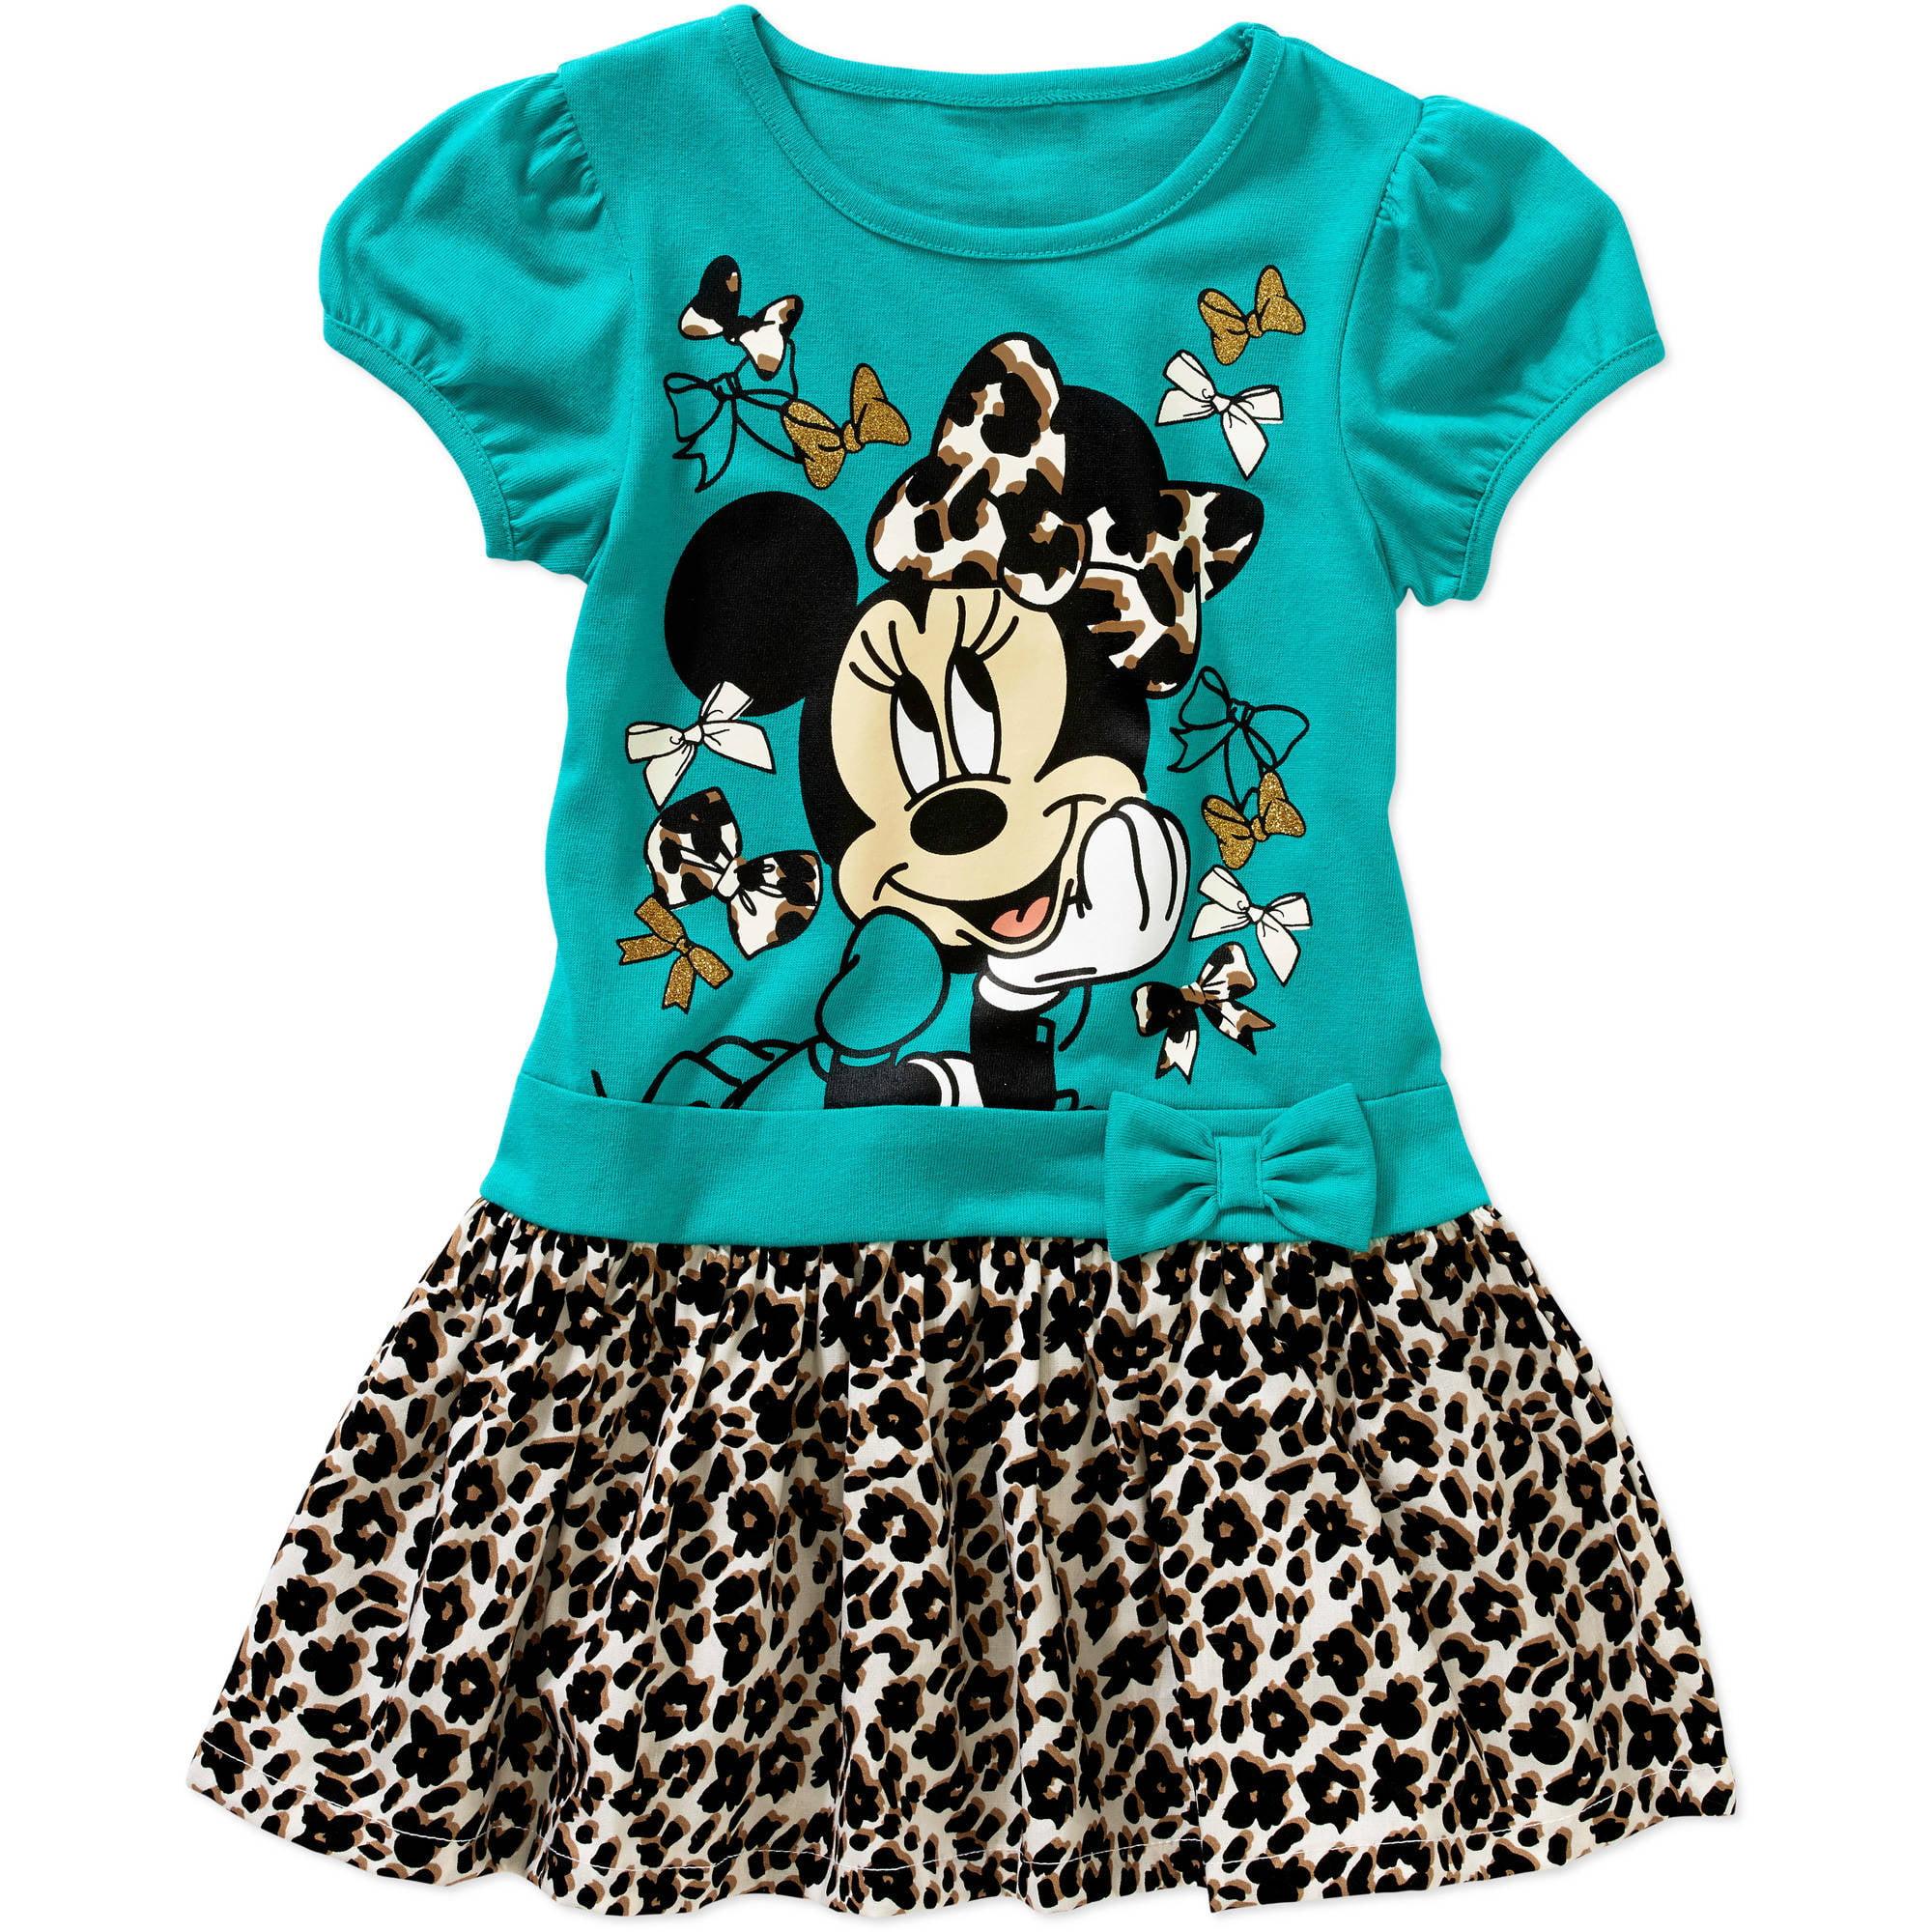 Minnie Mouse Toddler Girls' Tee Shirt Tutu Dress